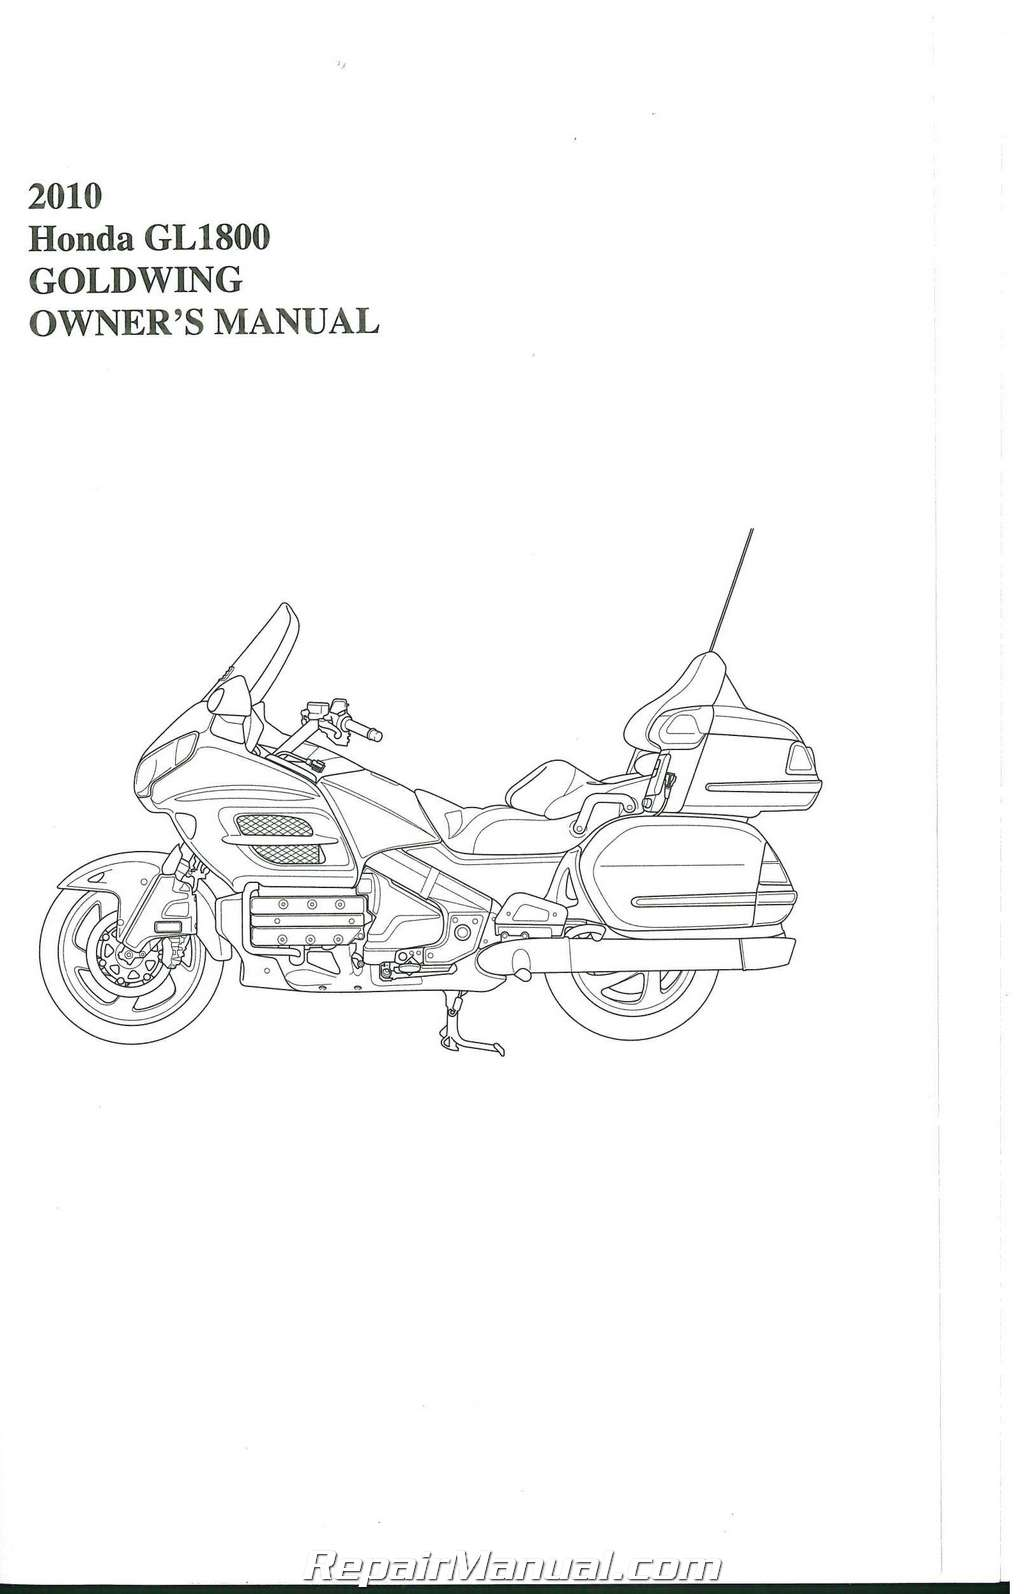 2010 Honda Gl1800 Gold Wing Motorcycle Owners Manual 31mca690 Ebay Wiring Diagram Communication 005